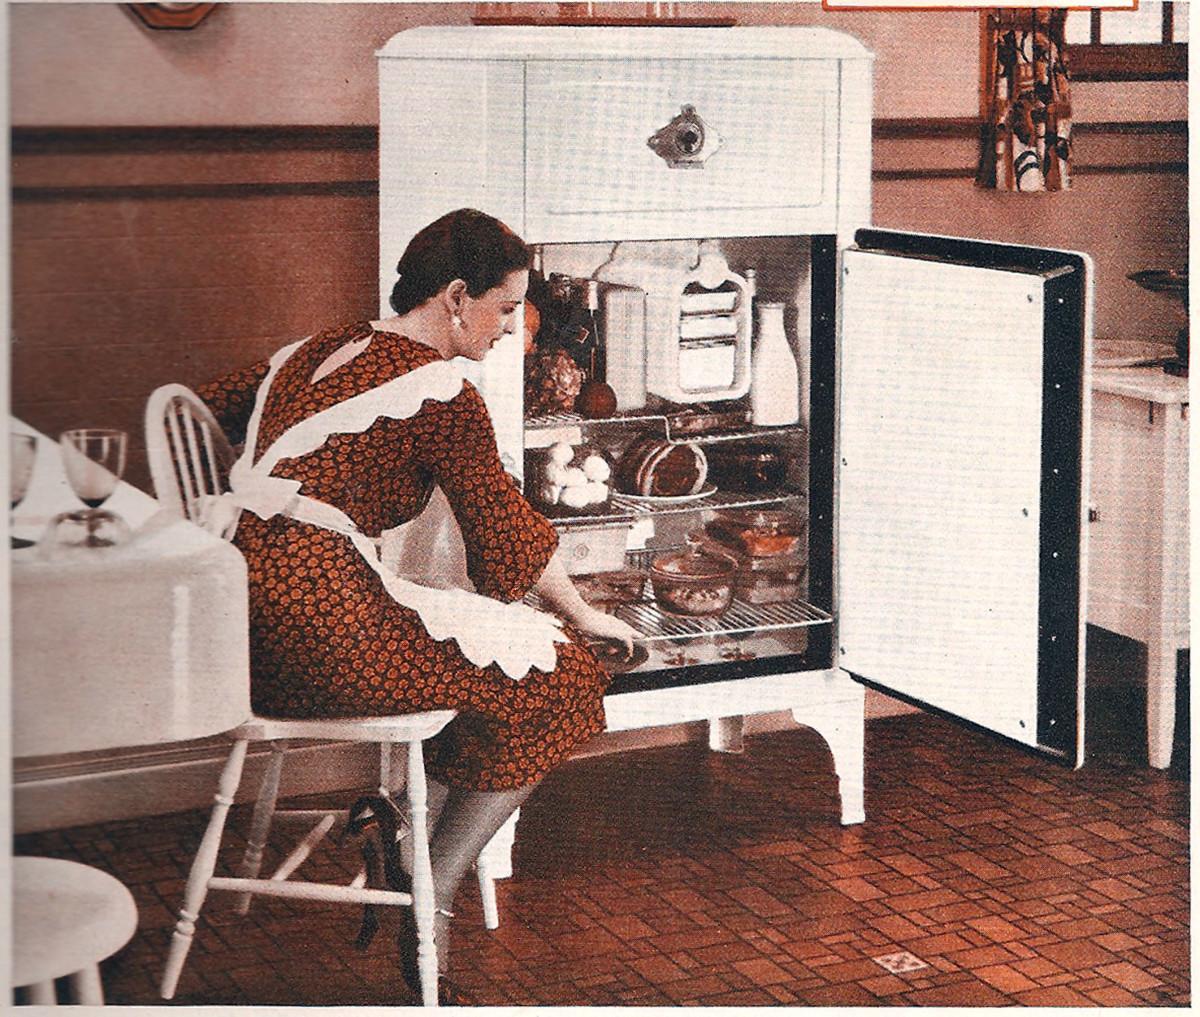 Westinghouse Refrigerator 1932